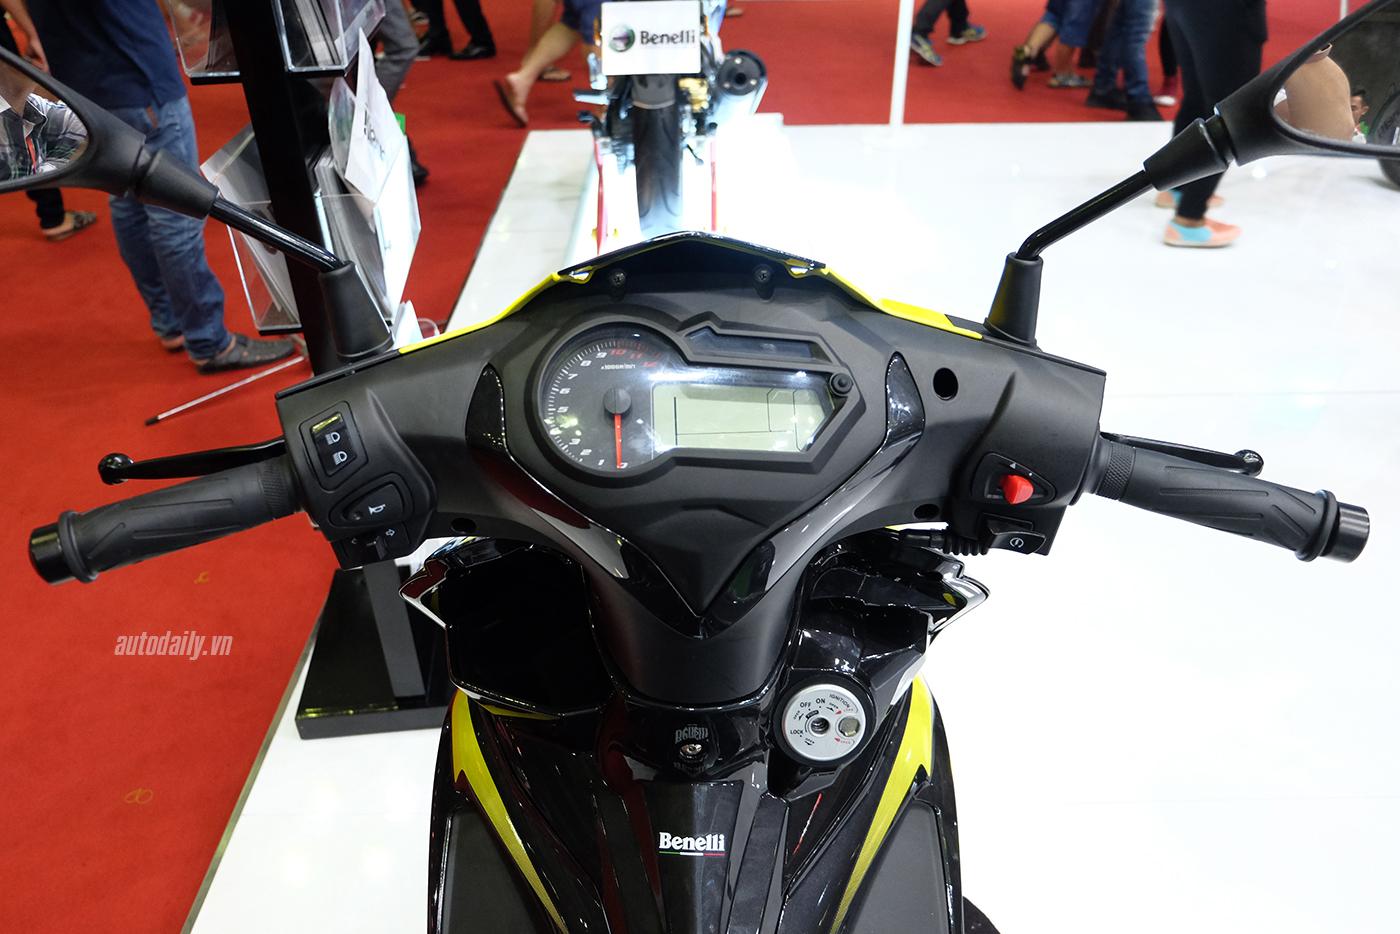 benelli-rsf-150i-48.JPG